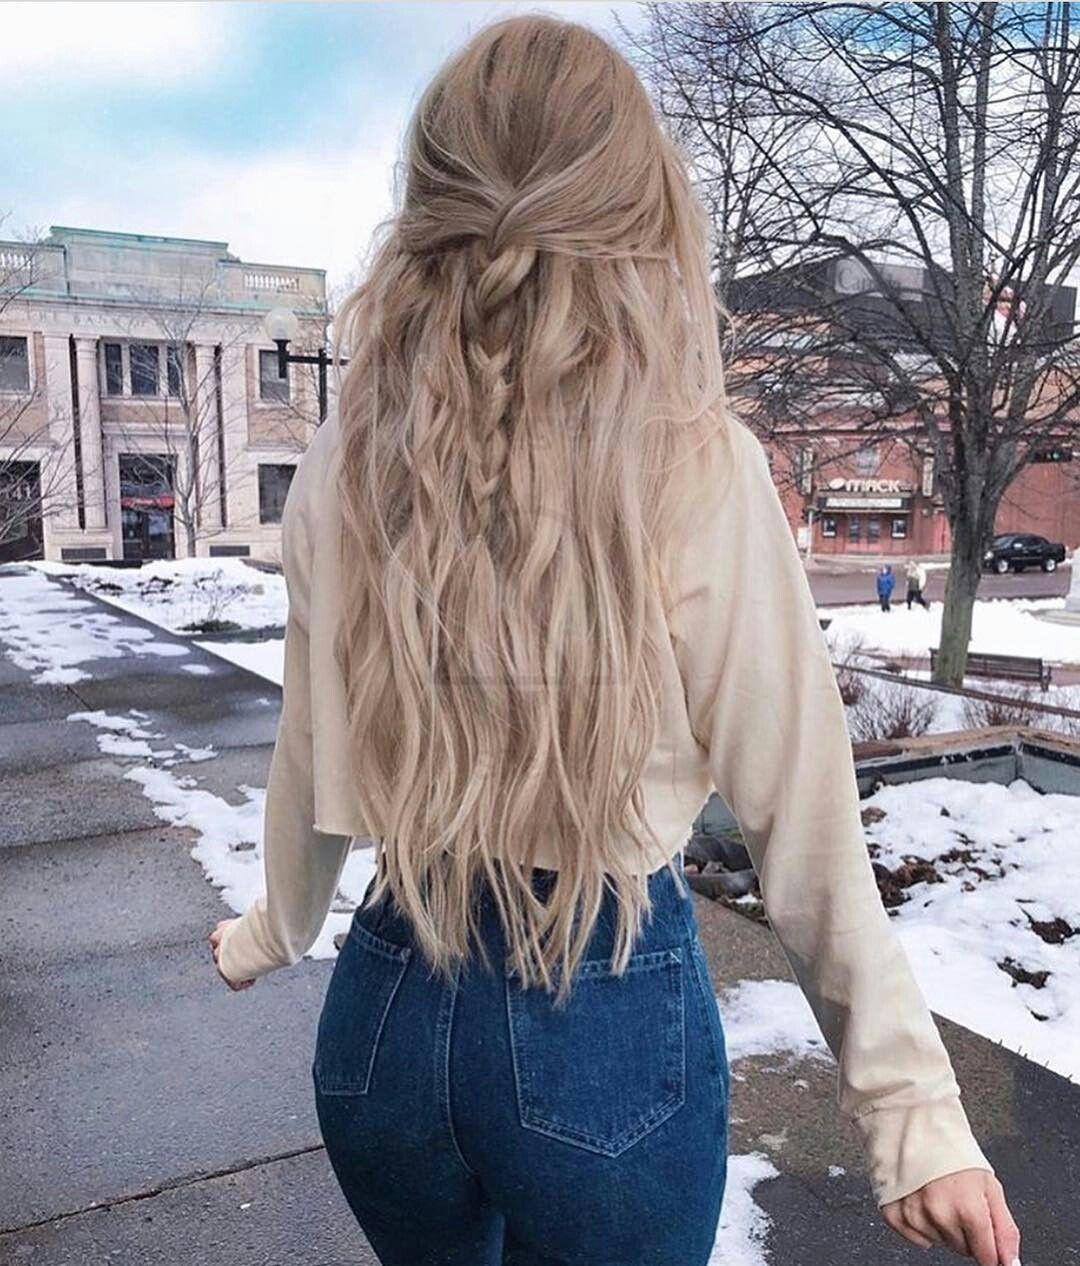 brxkensavvi) - #girl #tumblr #cute | .*~(girlys)~*. in 2019